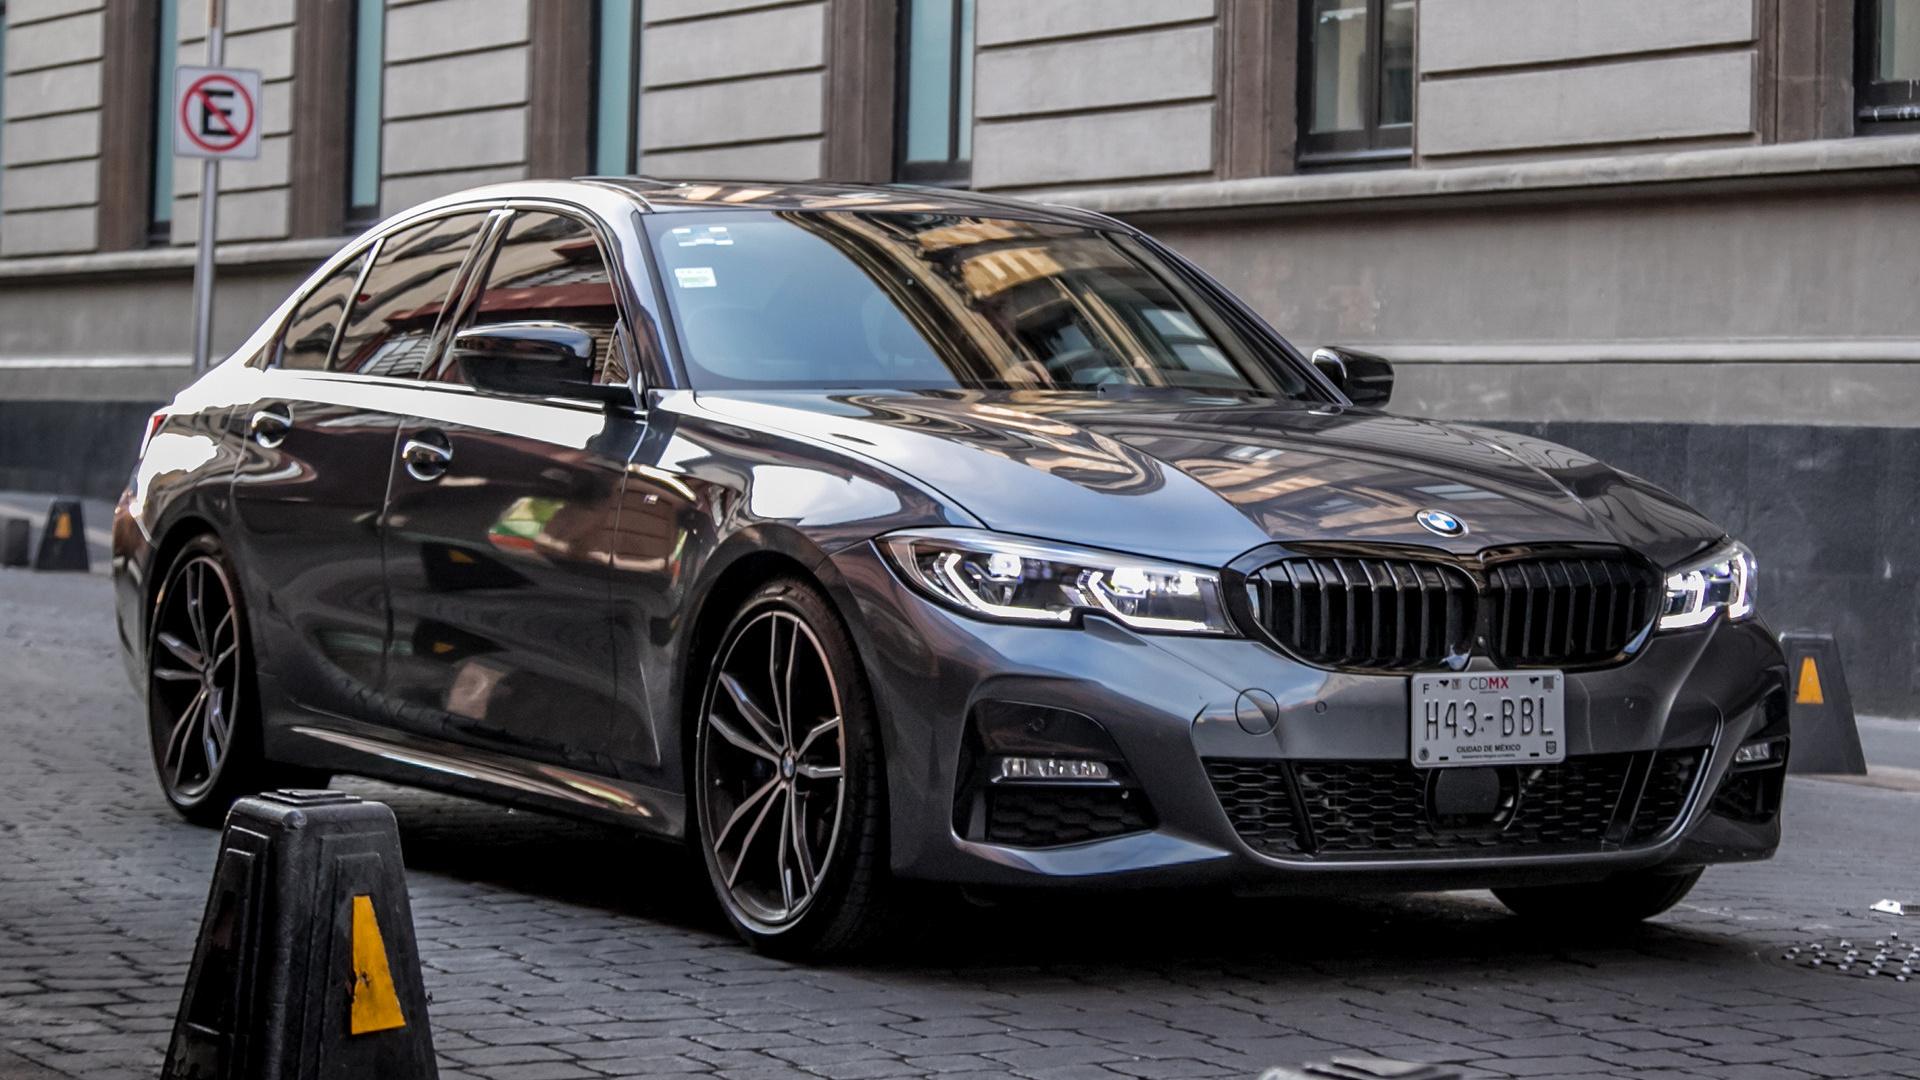 2019 BMW 3 Series M Sport Shadow Line (MX) - Wallpapers ...